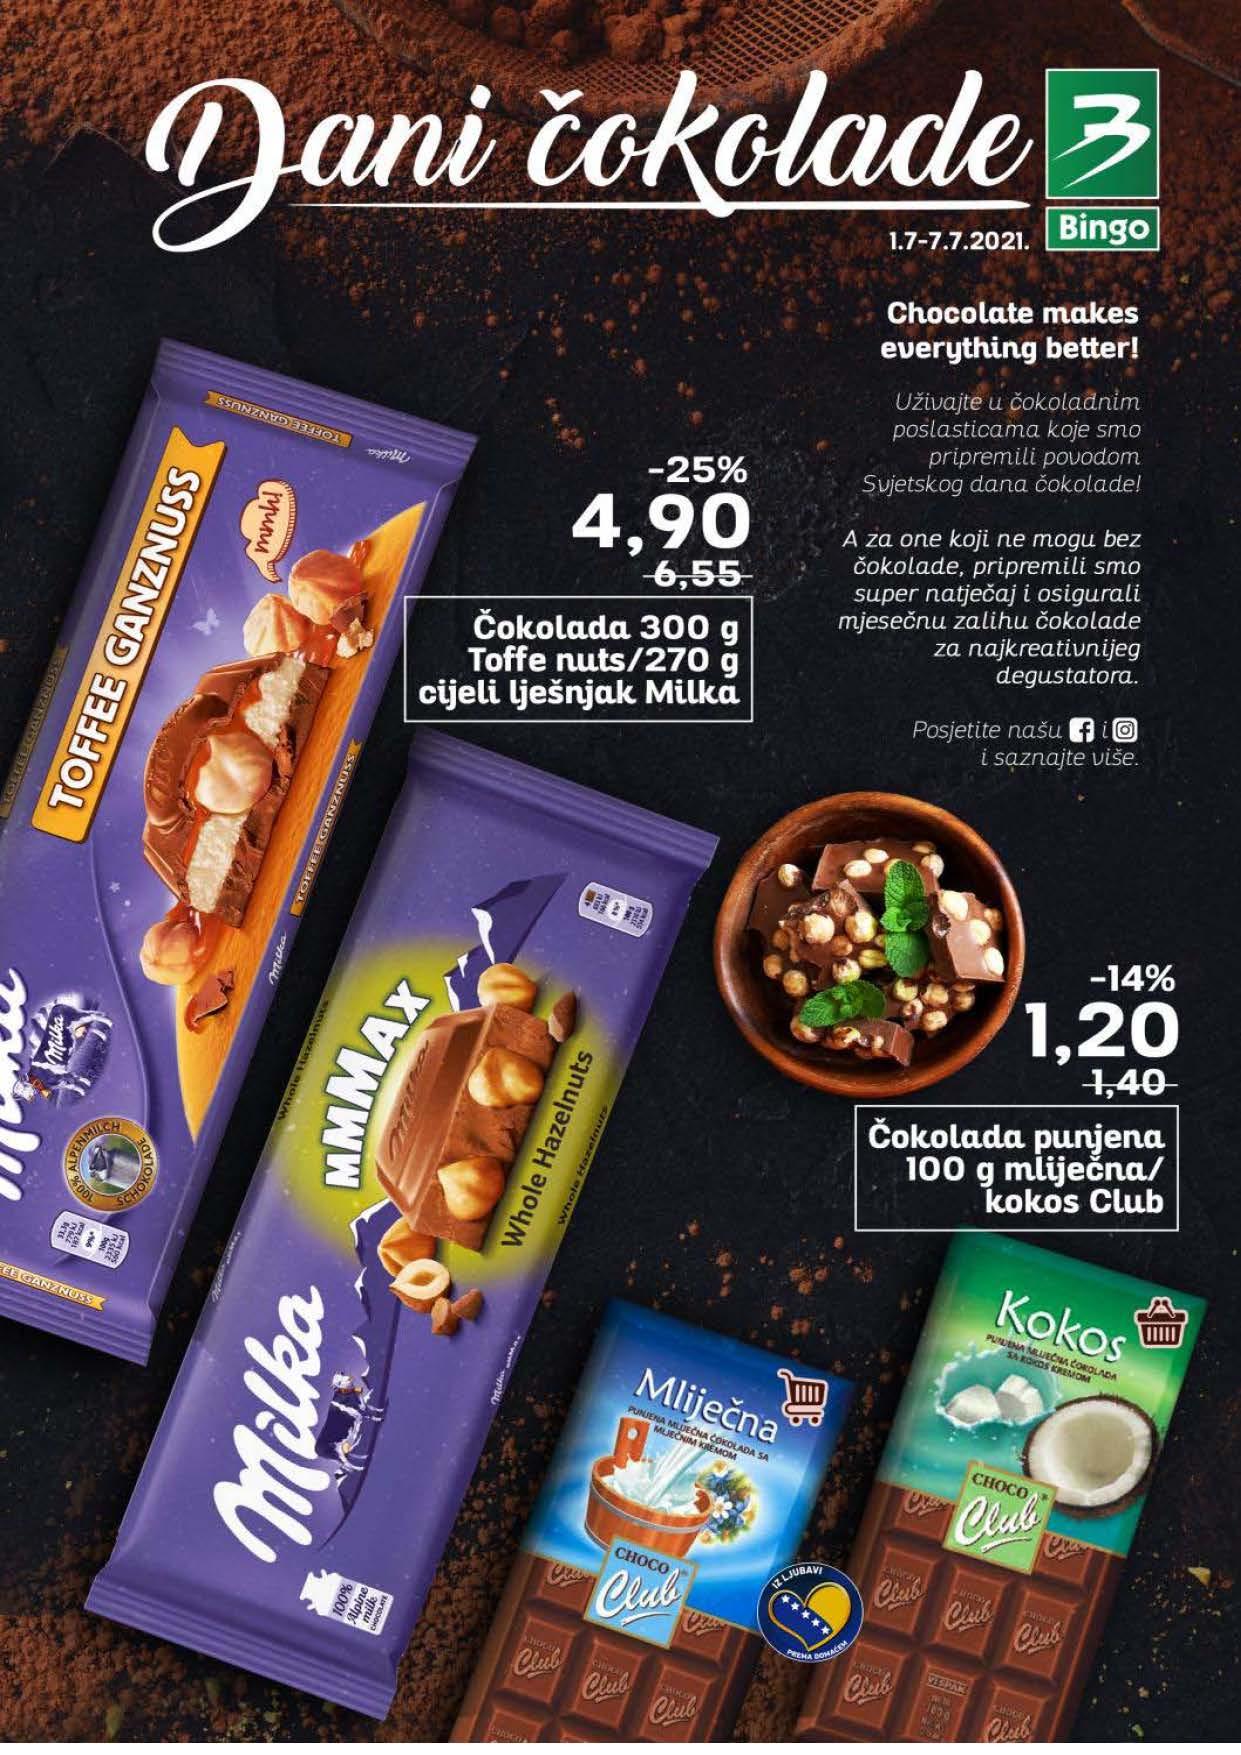 BINGO Katalog Dani cokolade JUL 2021 1.7.2021. 7.7.2021. Page 1